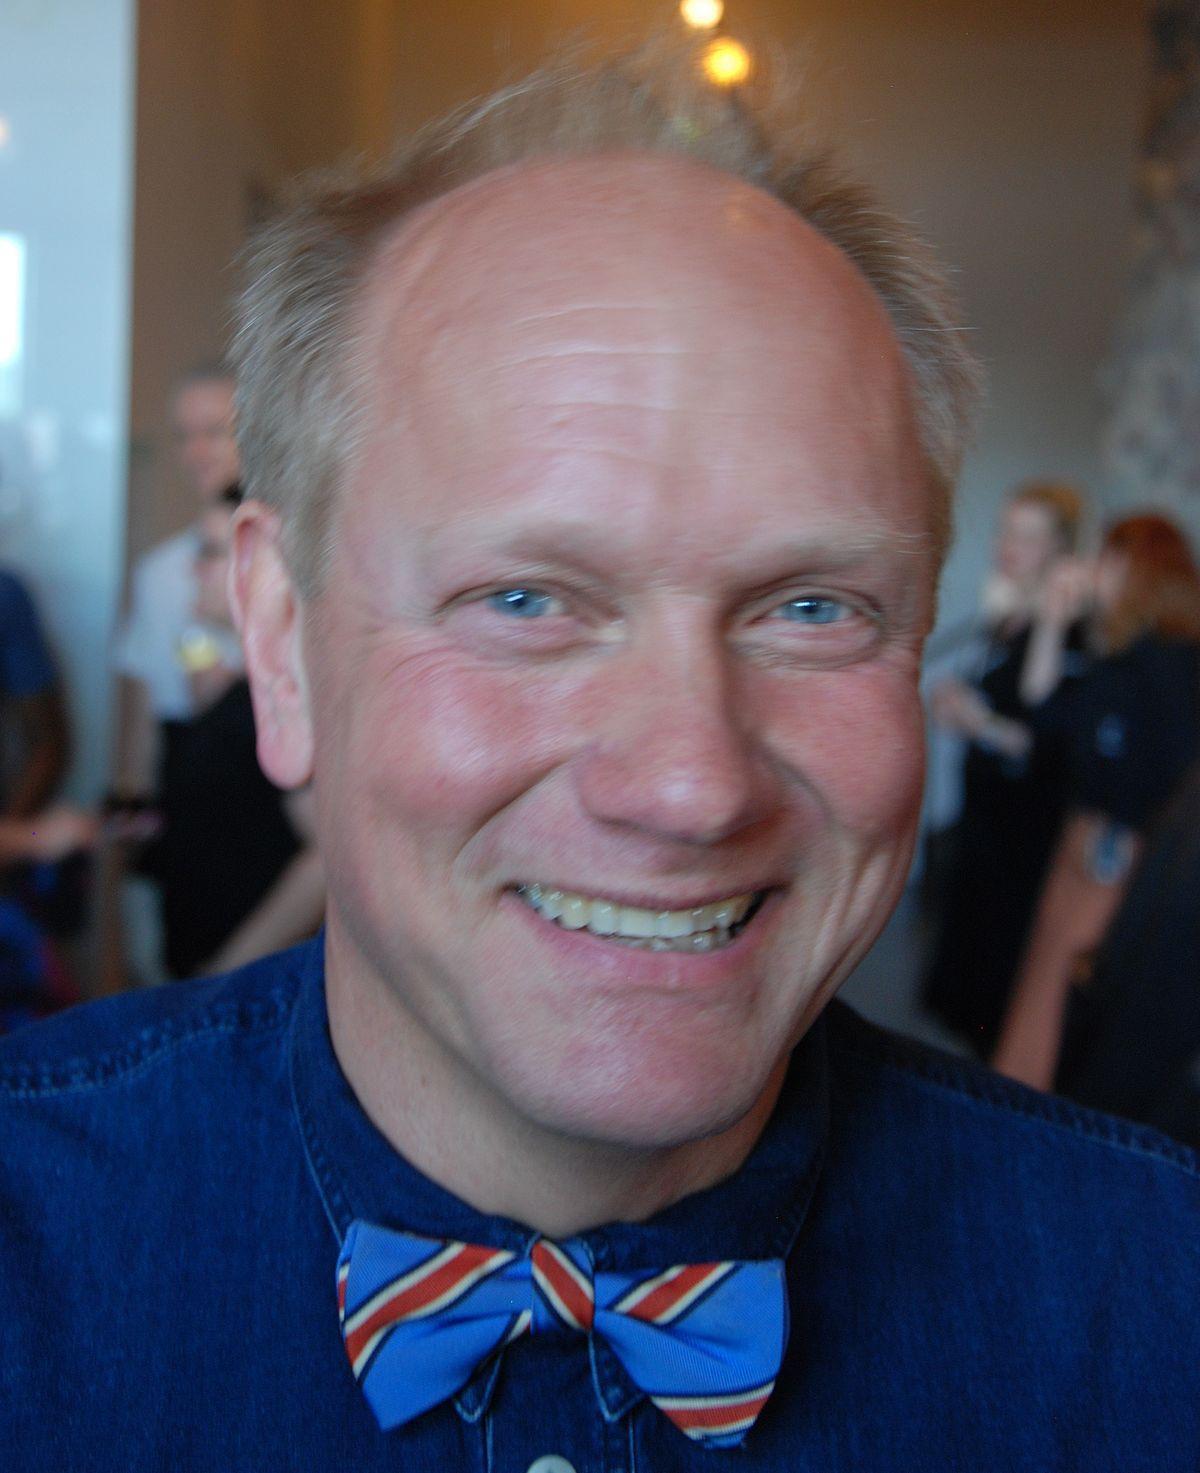 Petri Johansson